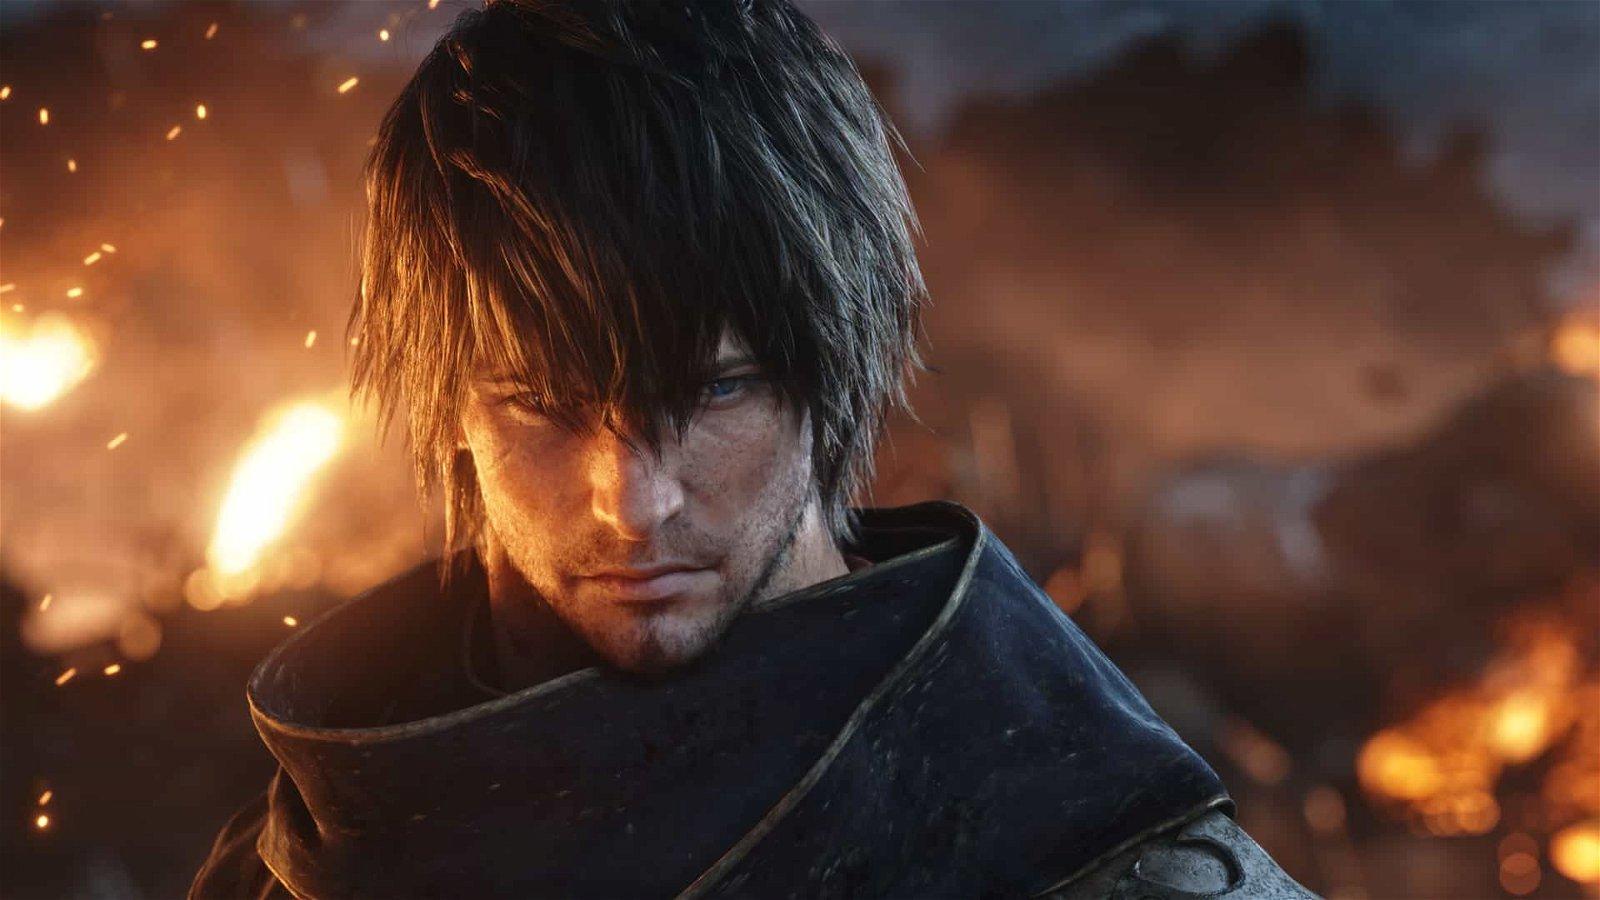 Final Fantasy XIV: Shadowbringers Interview with Naoki Yoshida 5